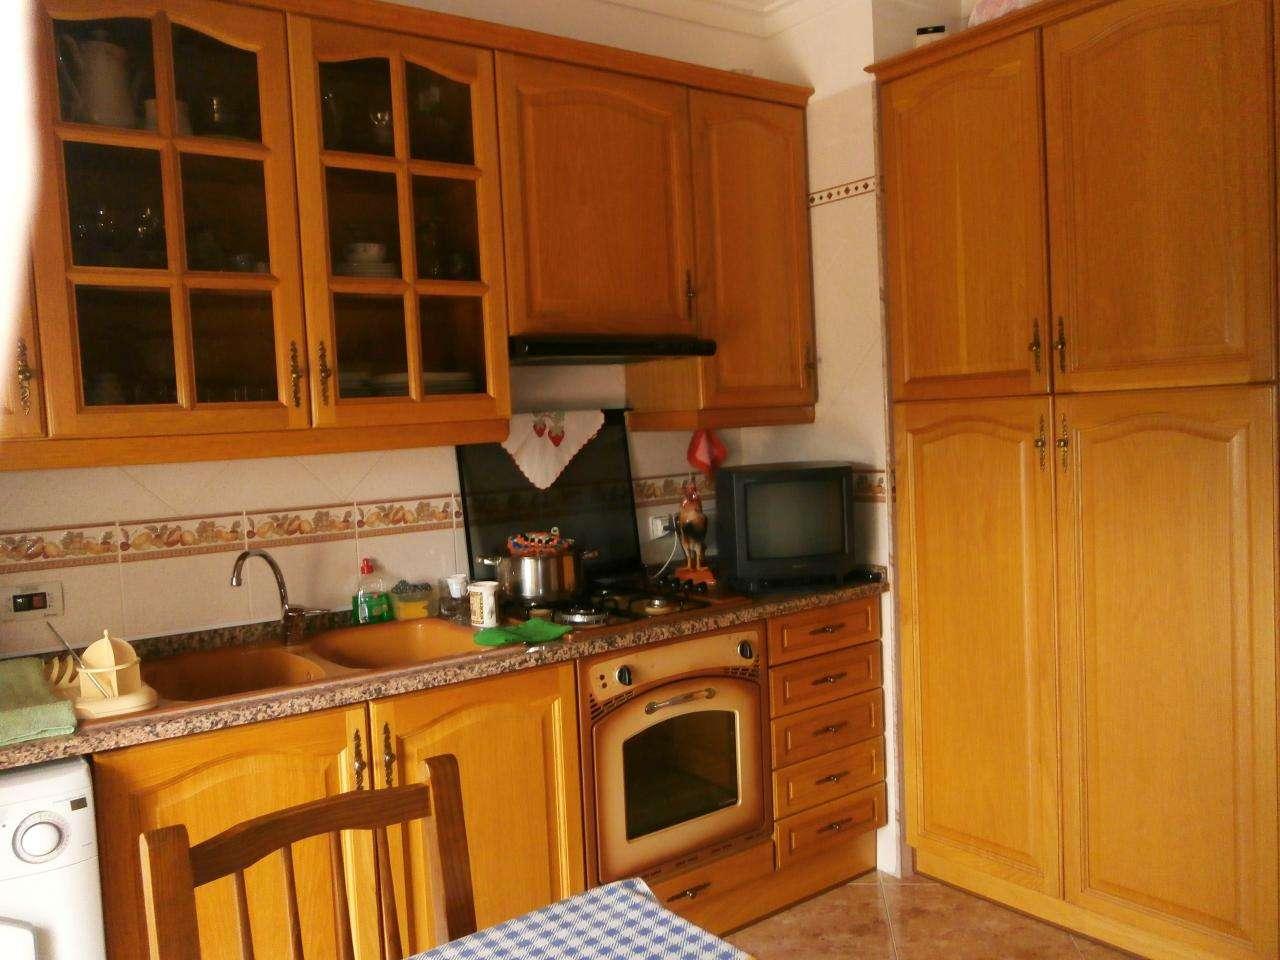 Apartamento para comprar, Vialonga, Vila Franca de Xira, Lisboa - Foto 1